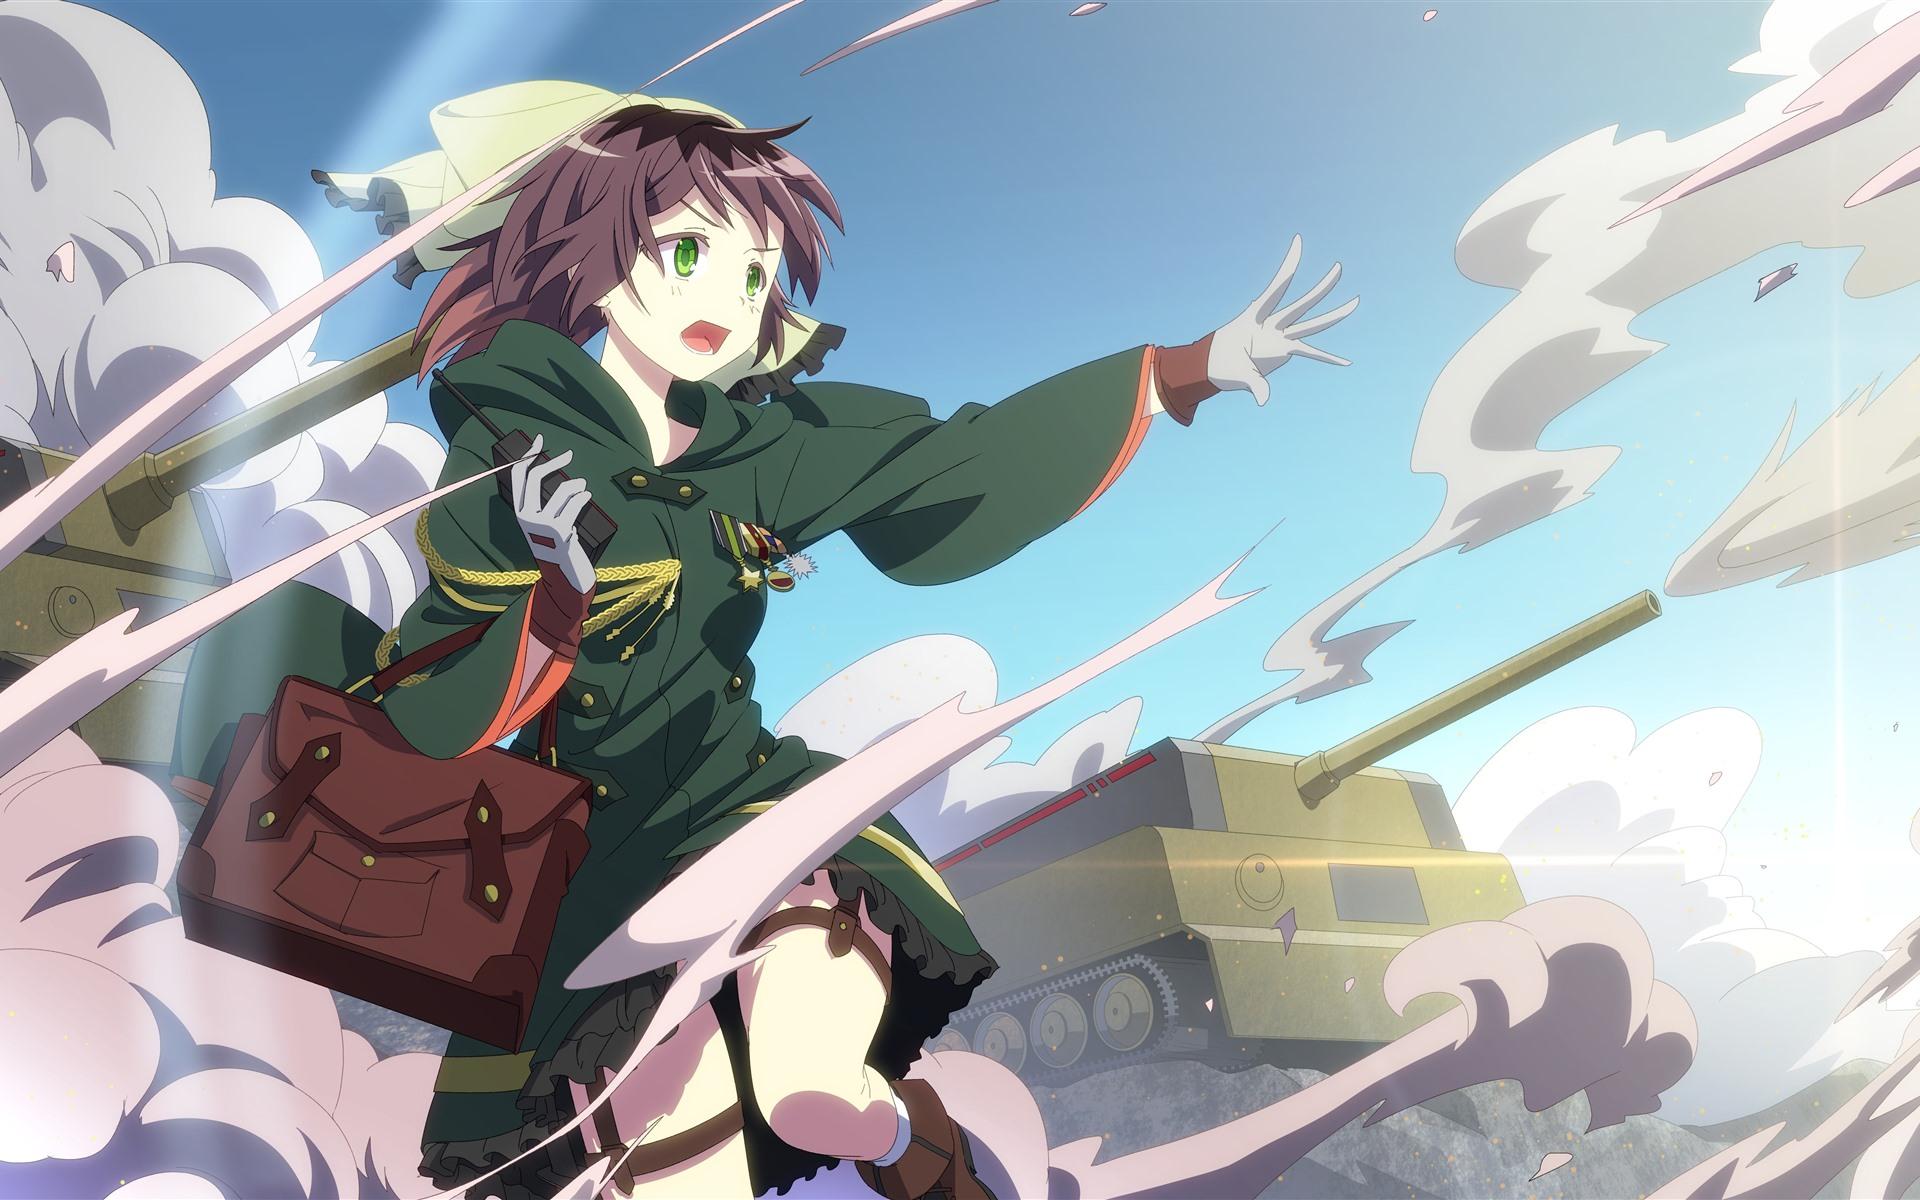 Wallpaper Green Eyes Anime Girl Tank War 5120x2880 Uhd 5k